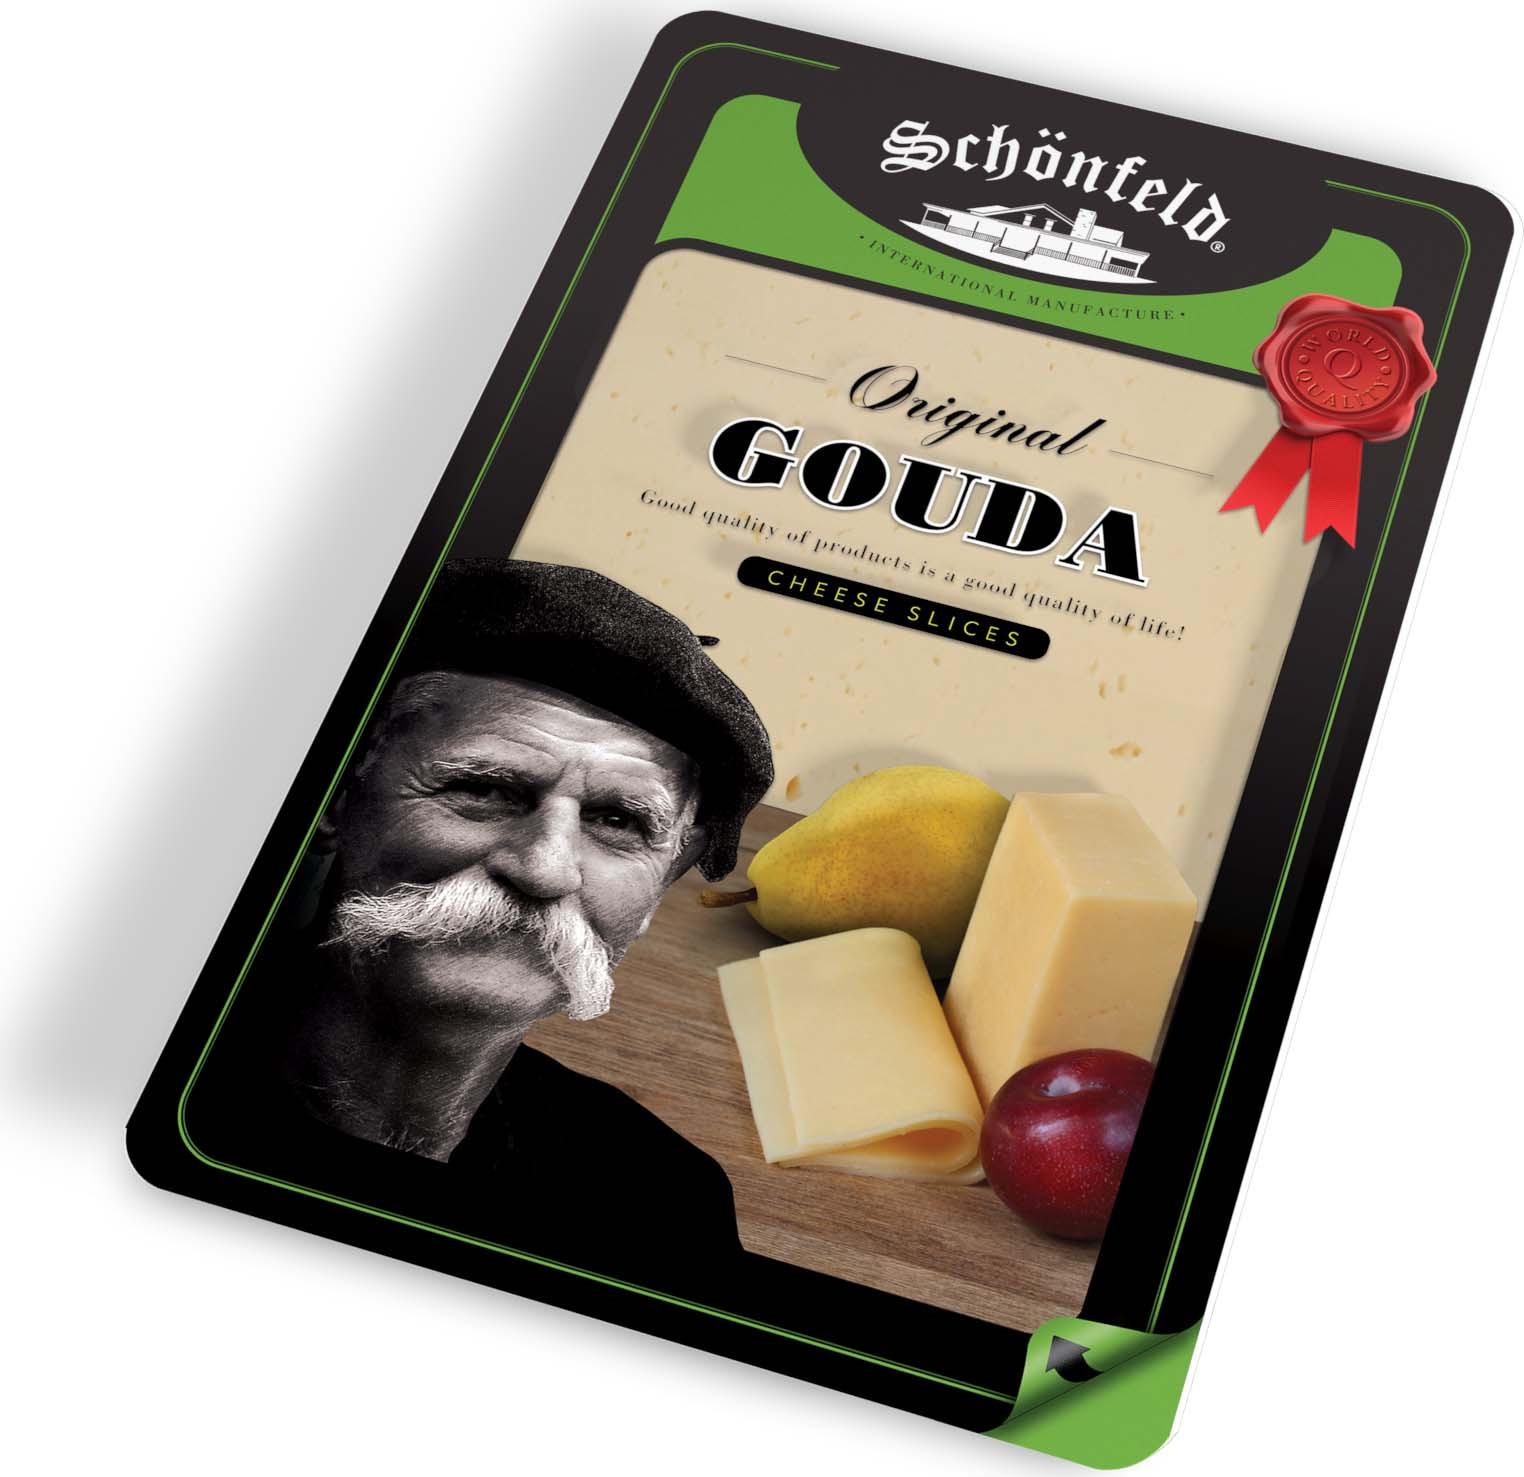 Сыр Schonfeld Гауда 45%, нарезка, 150 г